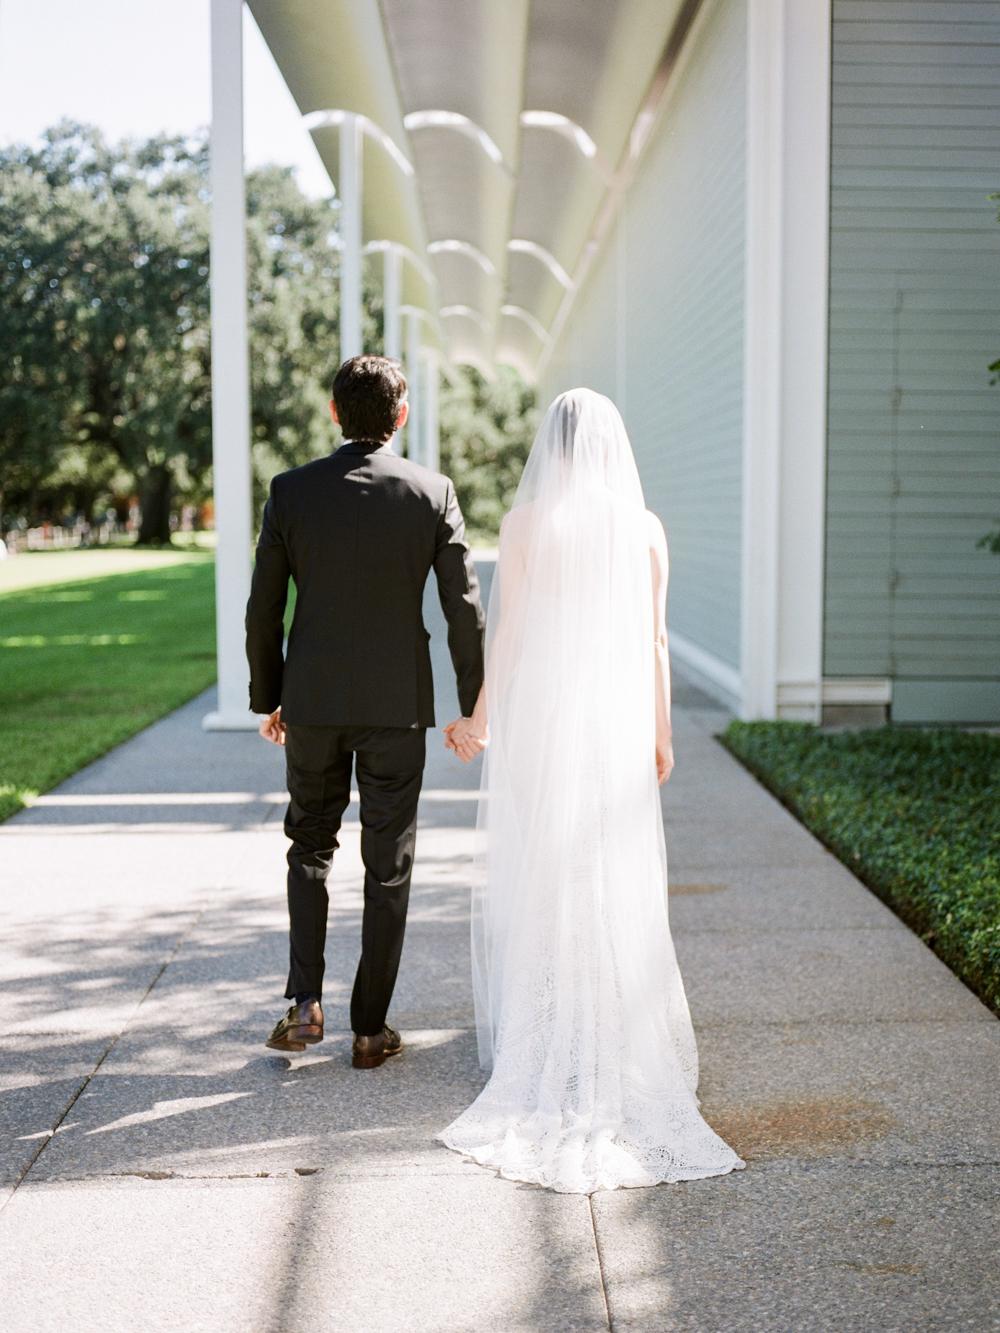 fall wedding at rothko chapel- houston wedding photographer-christine gosch - film photographer - elopement photographer- intimate wedding - lovely bride wedding gown-9.jpg